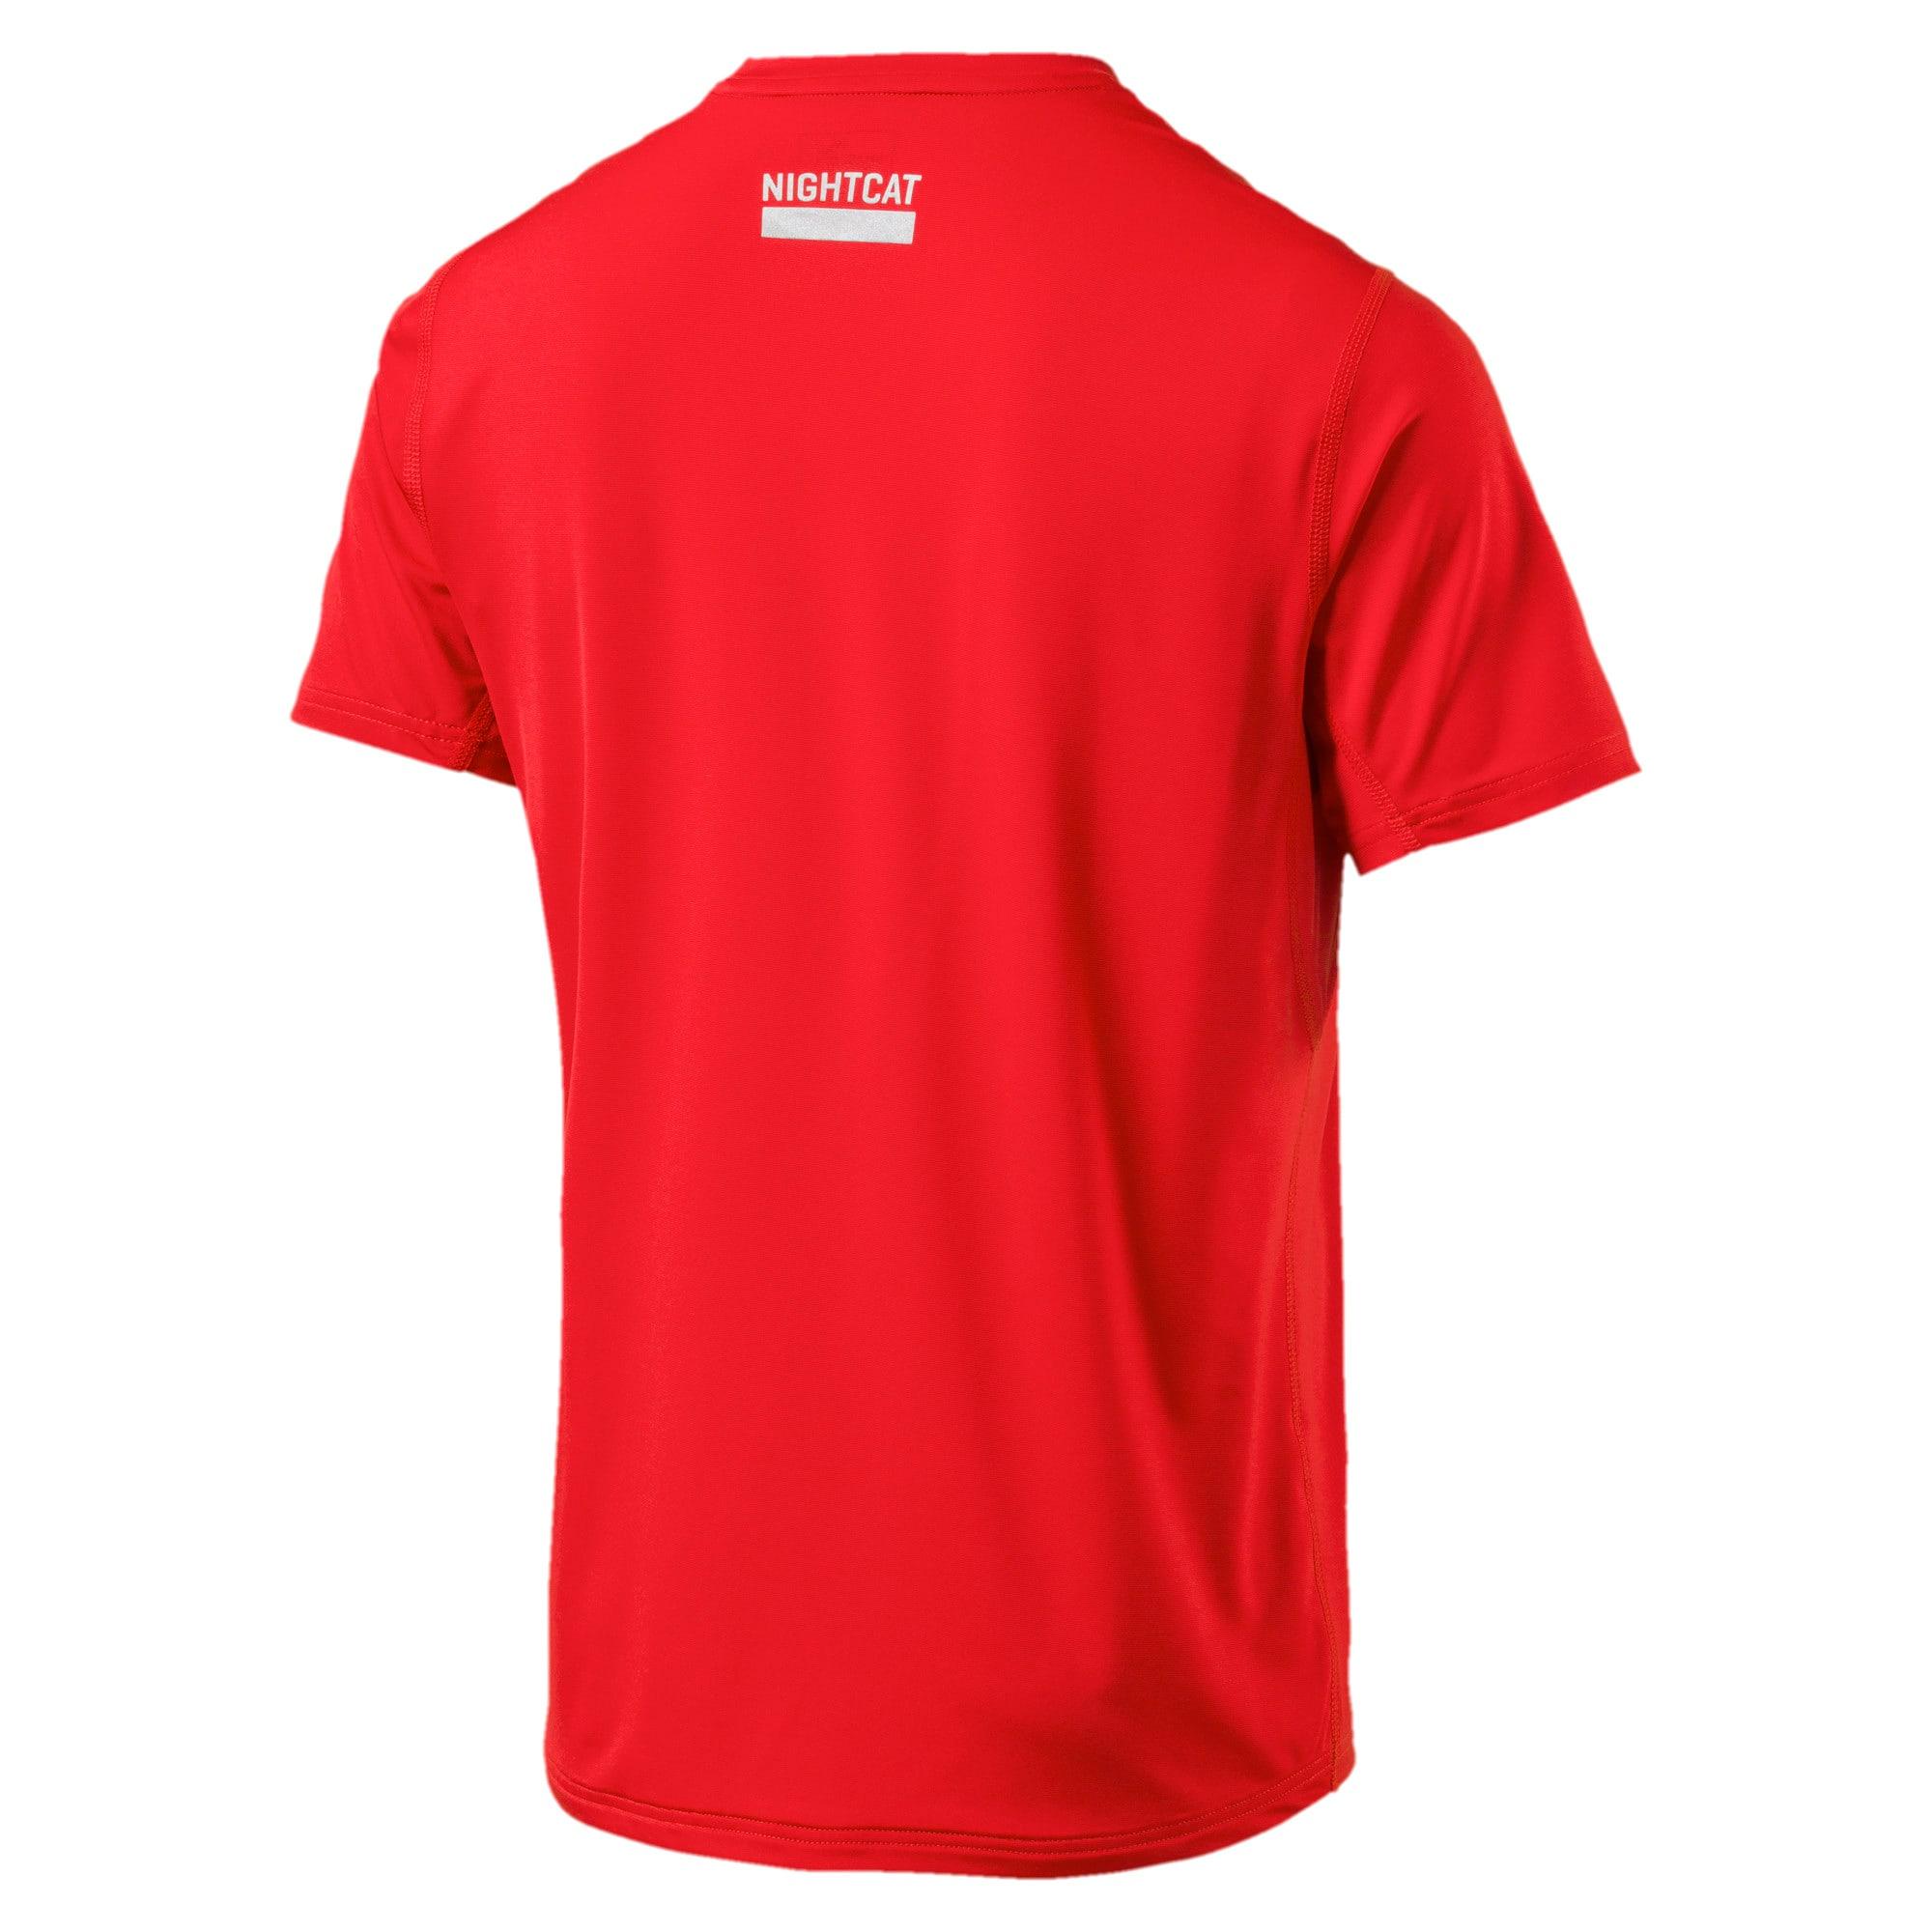 Thumbnail 2 of NightCat Men's Short Sleeve T-Shirt, Flame Scarlet, medium-IND